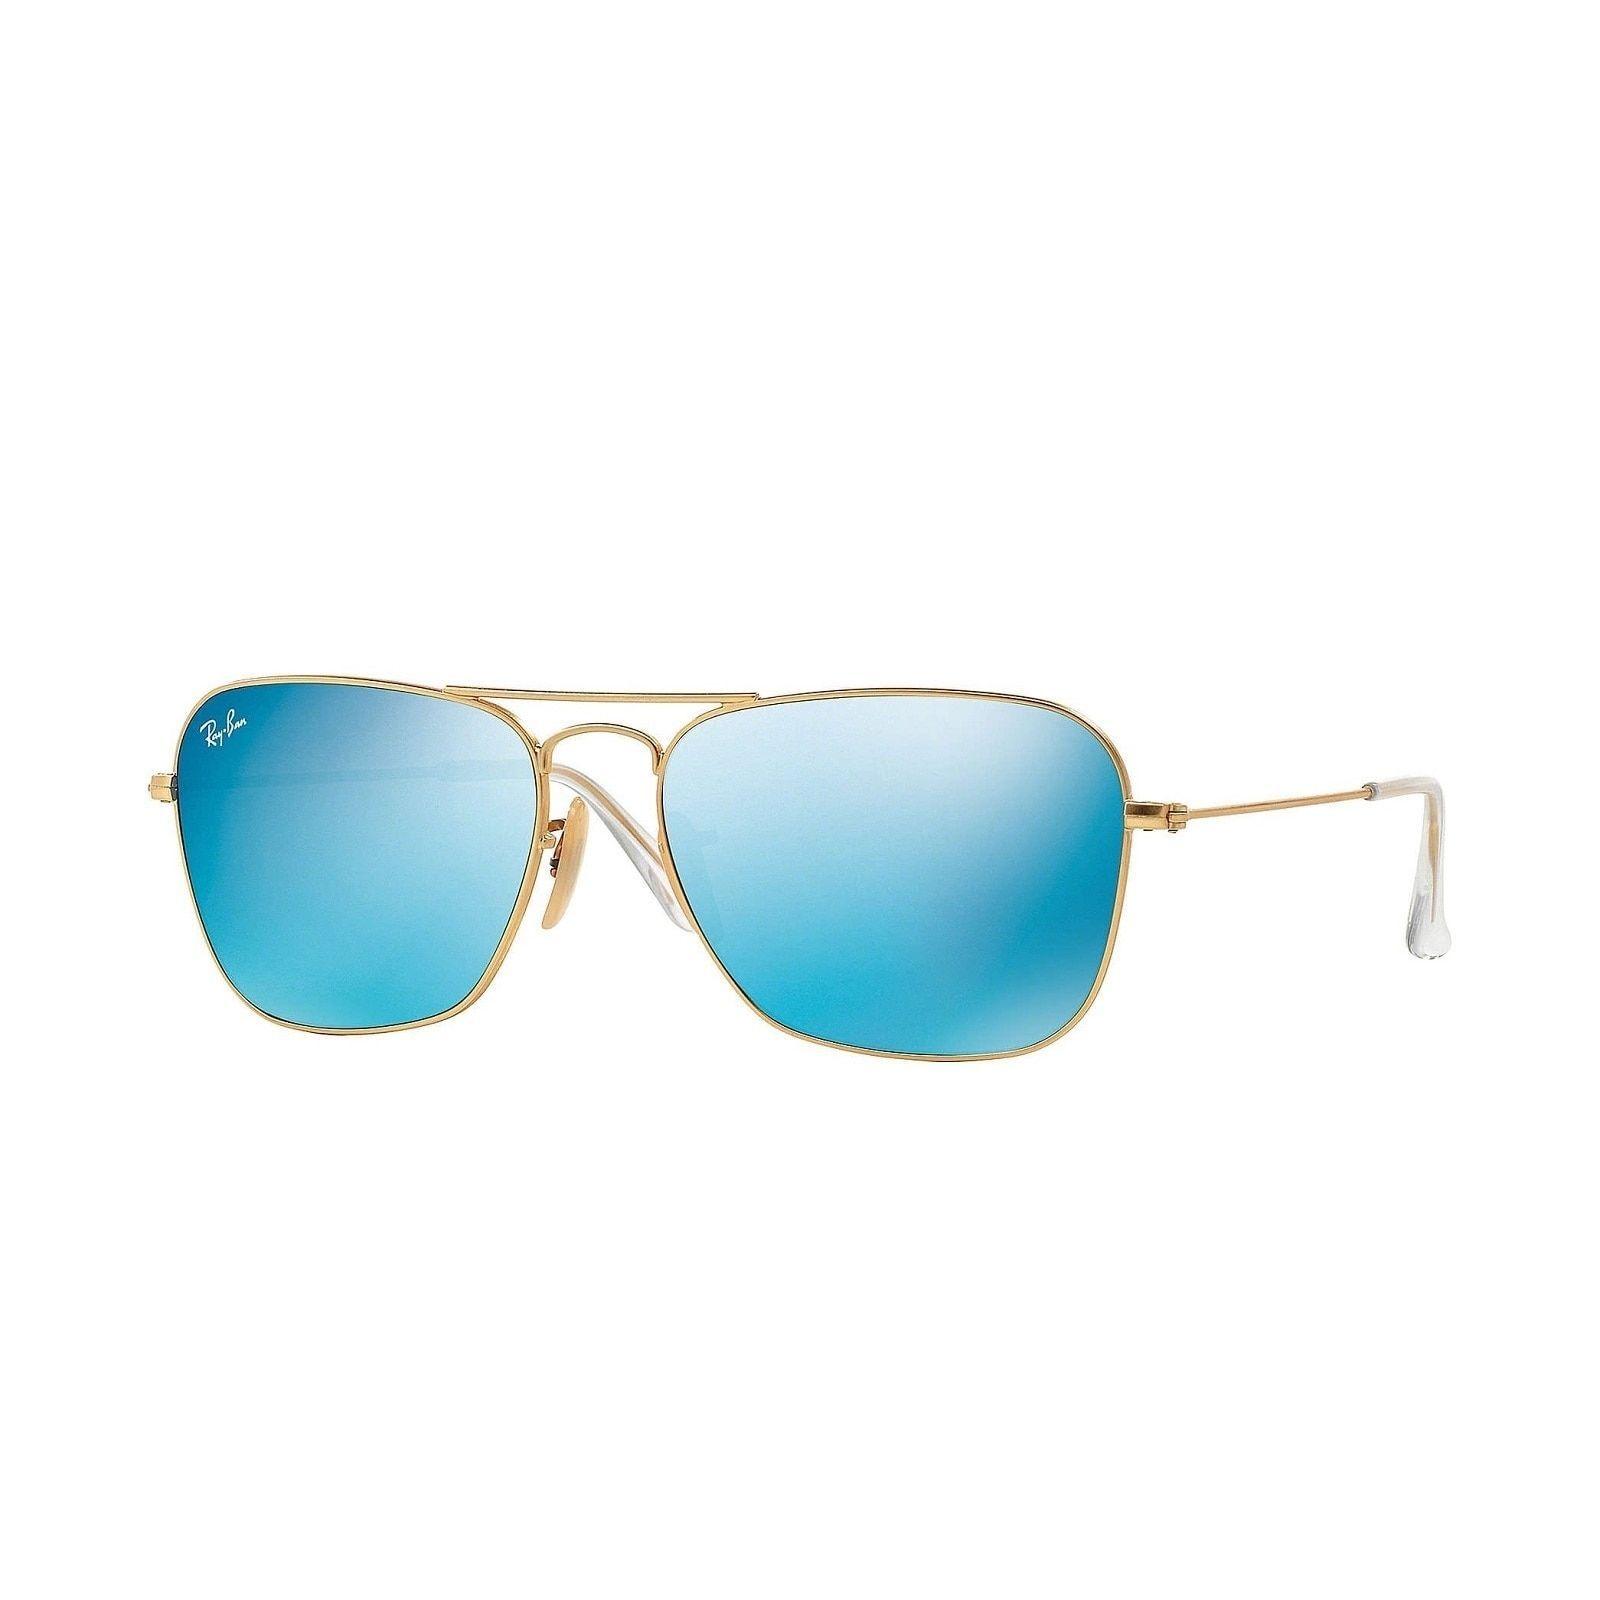 70efe99eb4b Ray-Ban Caravan RB3136 112 17 Gold Frame Blue Flash 58mm Lens Sunglasses ( RB3136 112 17 58)